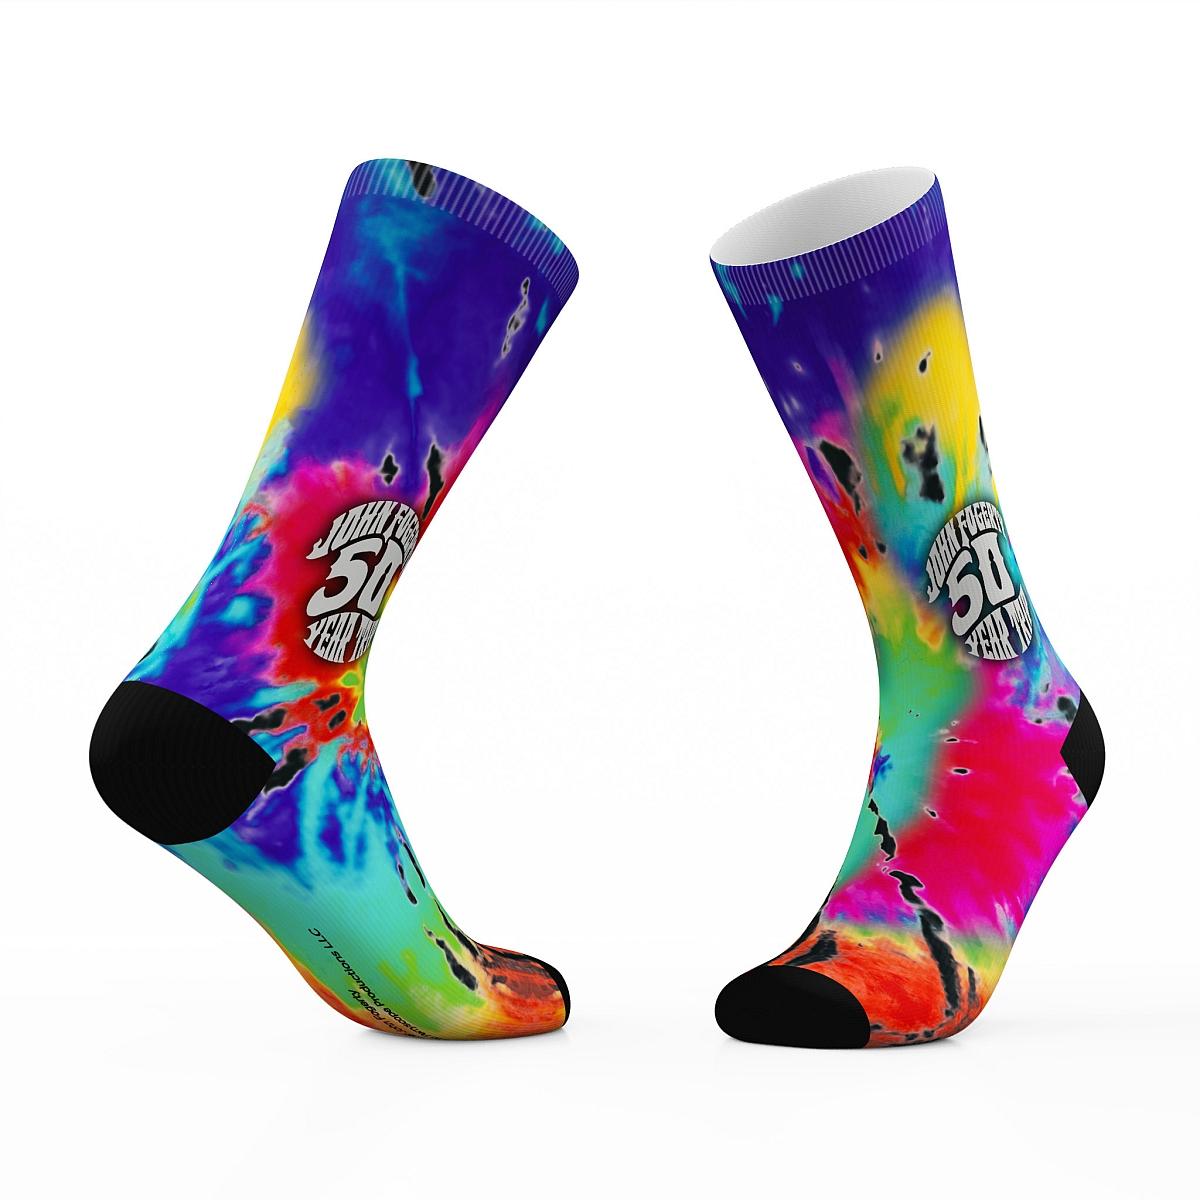 John Fogerty 50 Year Trip Tie Dye Crew Socks